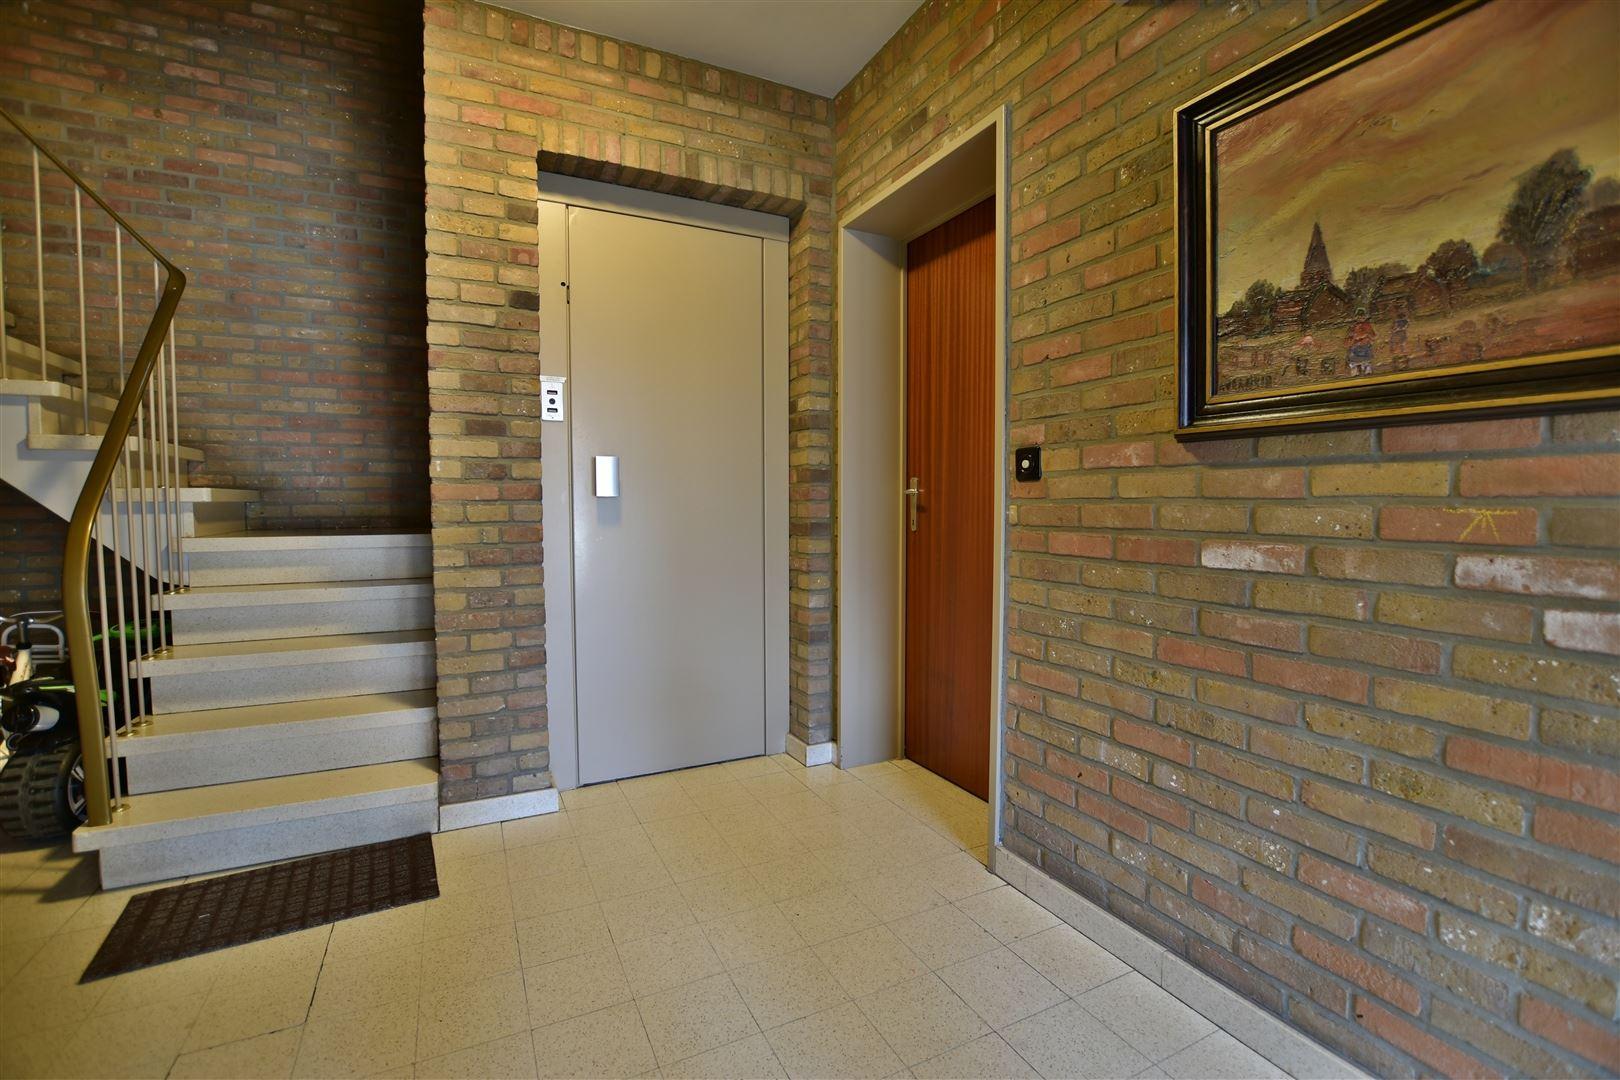 Foto 12 : Appartement te 9140 TEMSE (België) - Prijs € 299.000